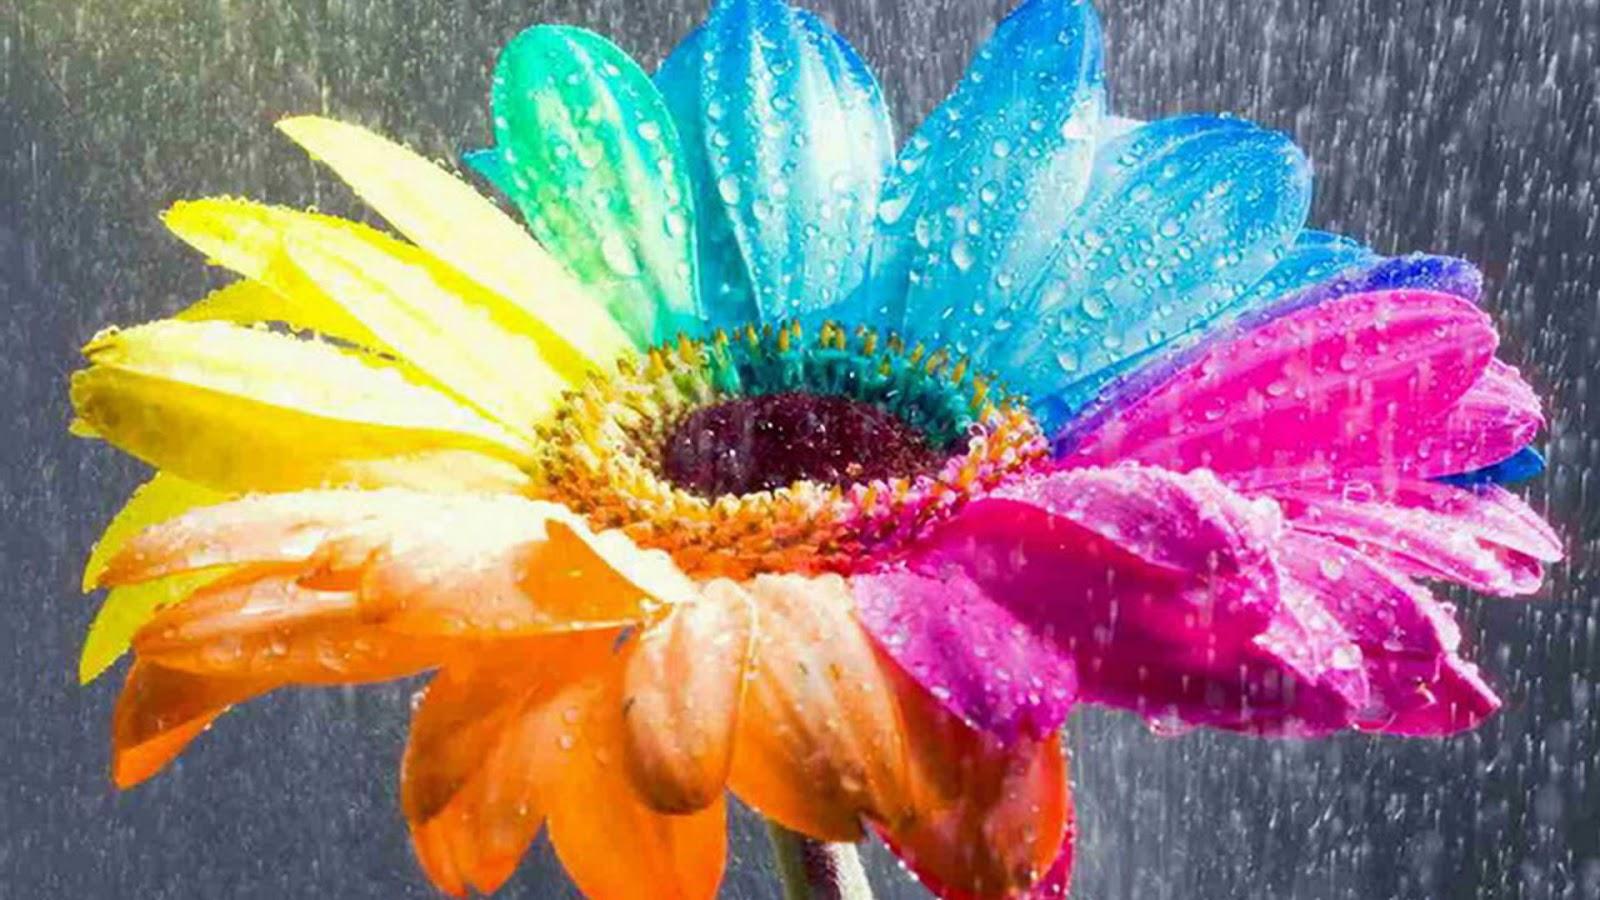 Garden Flower Wallpaper Blogging Tips Social Media TipsSEO Tips 1600x900